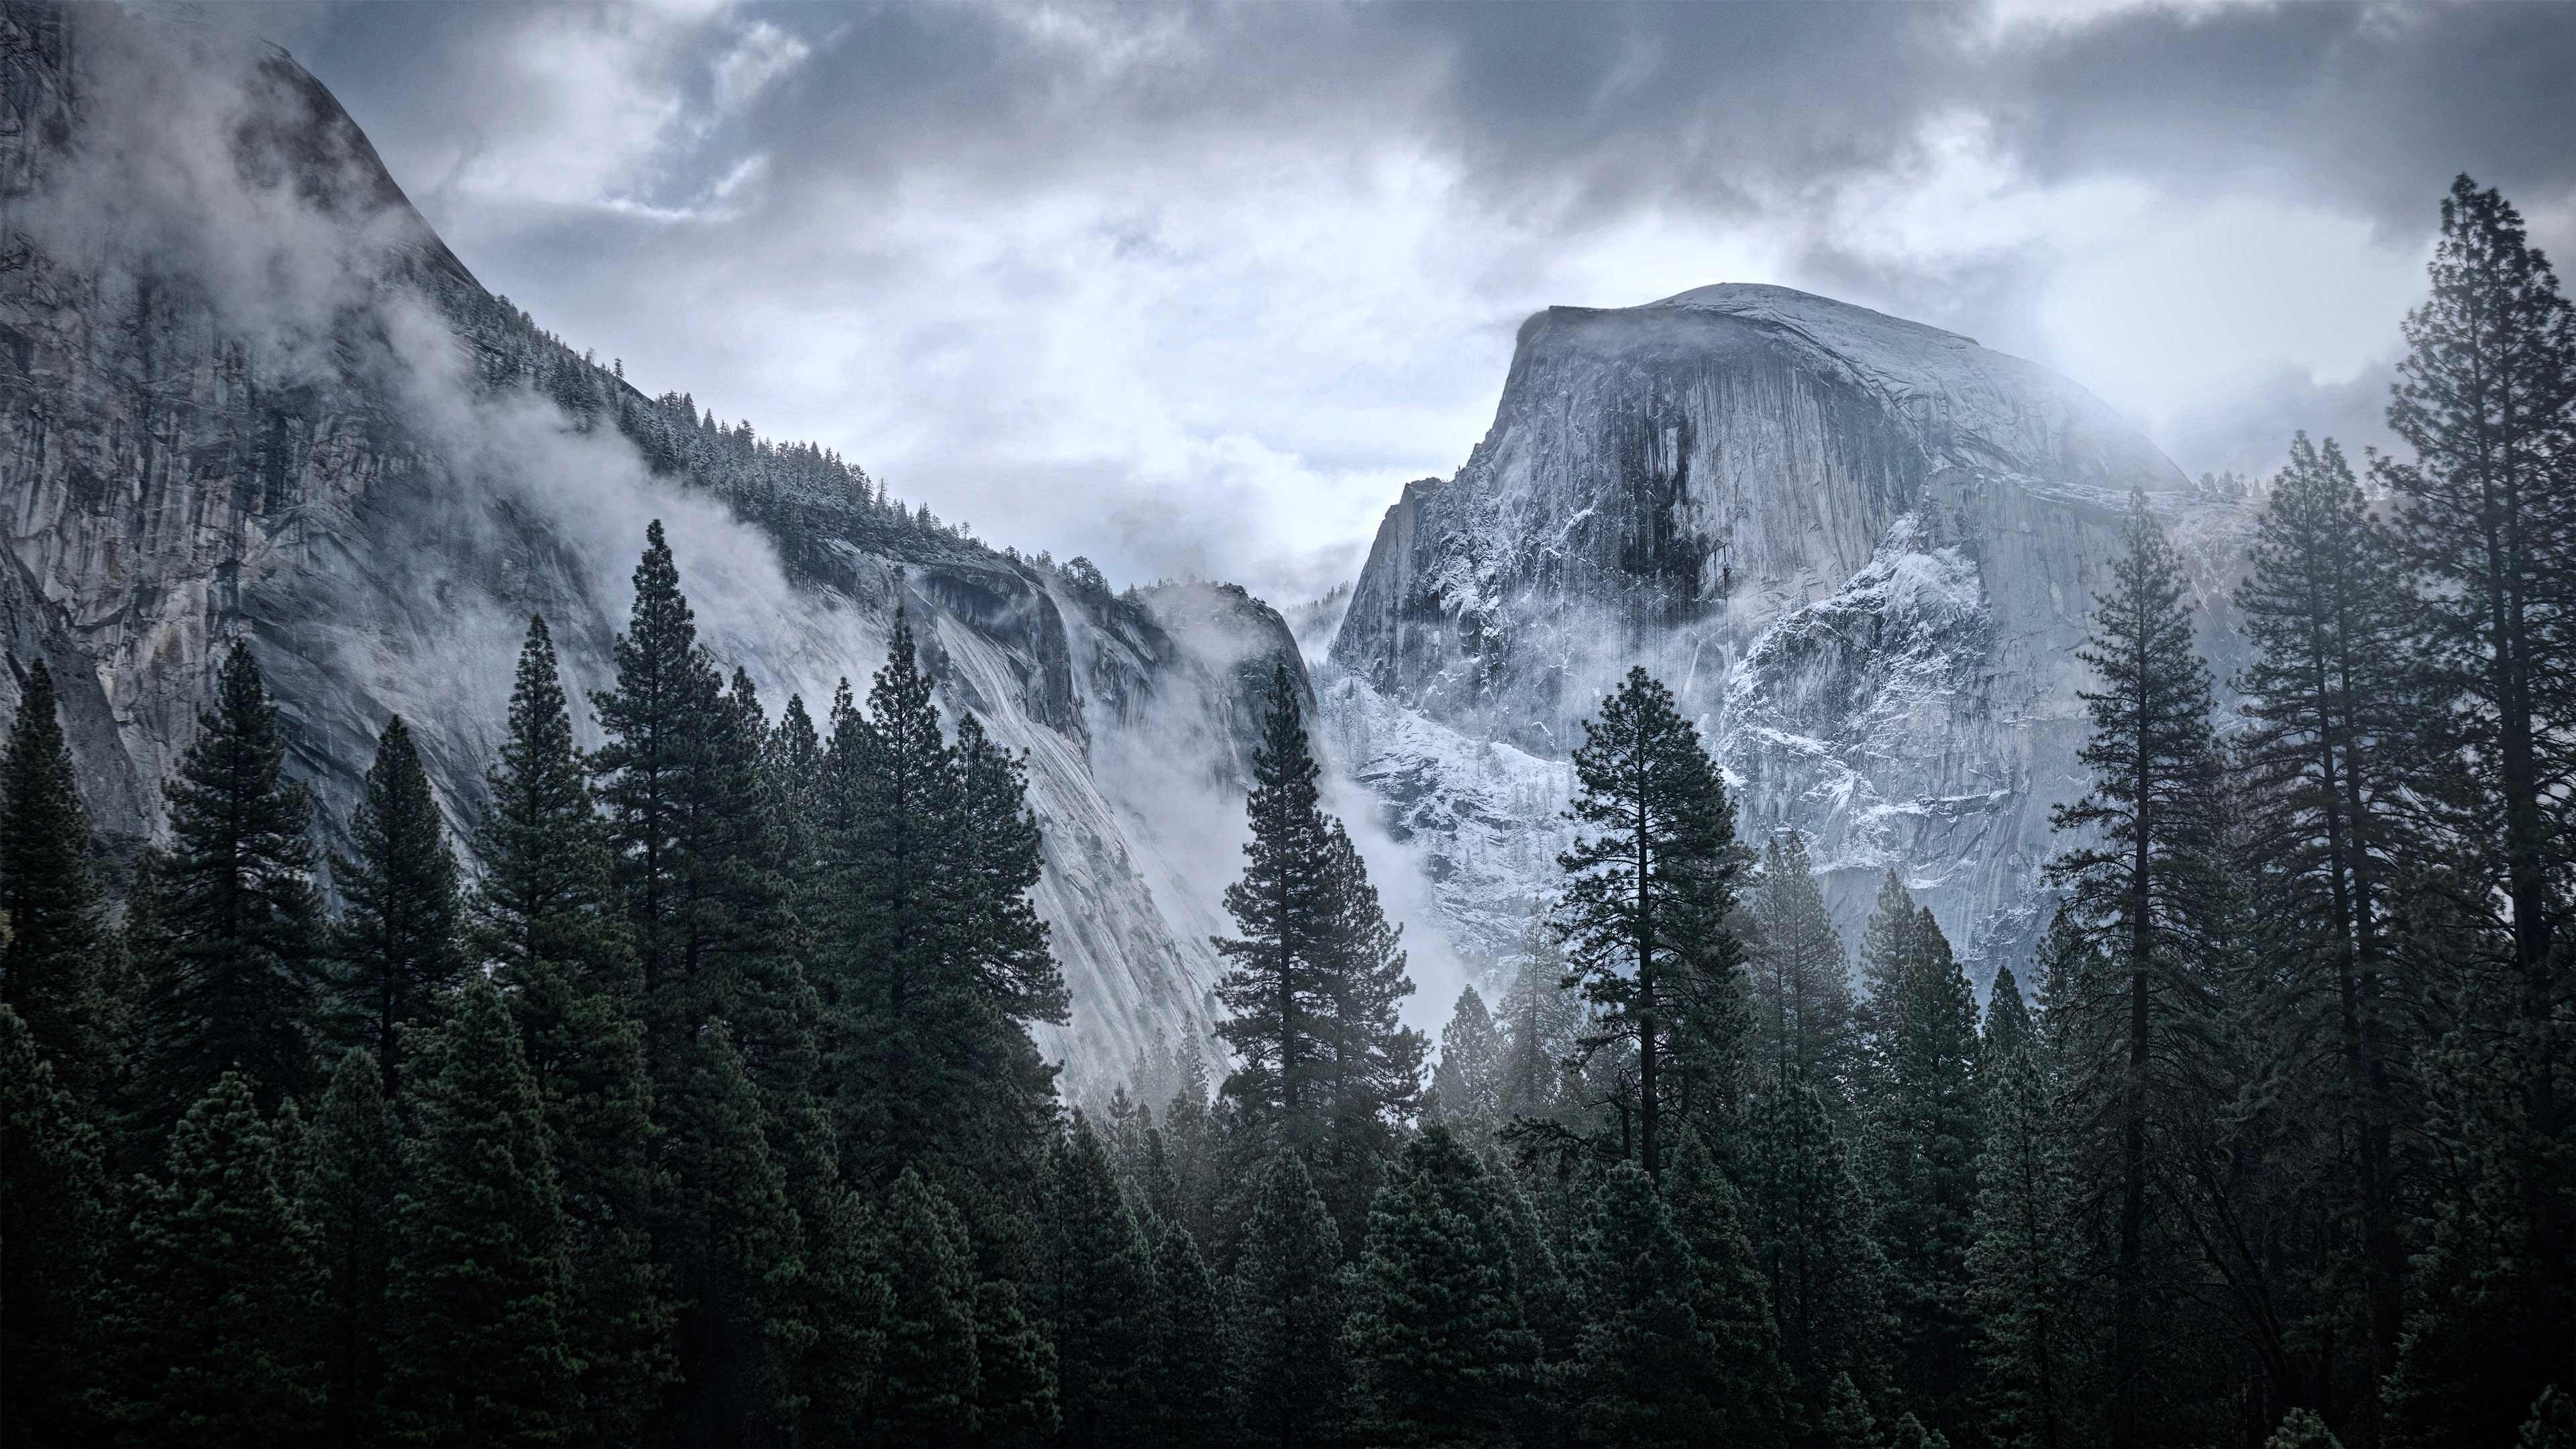 Wallpaper 4k 4k Yosemite Mountains 4k Wallpapers Hd